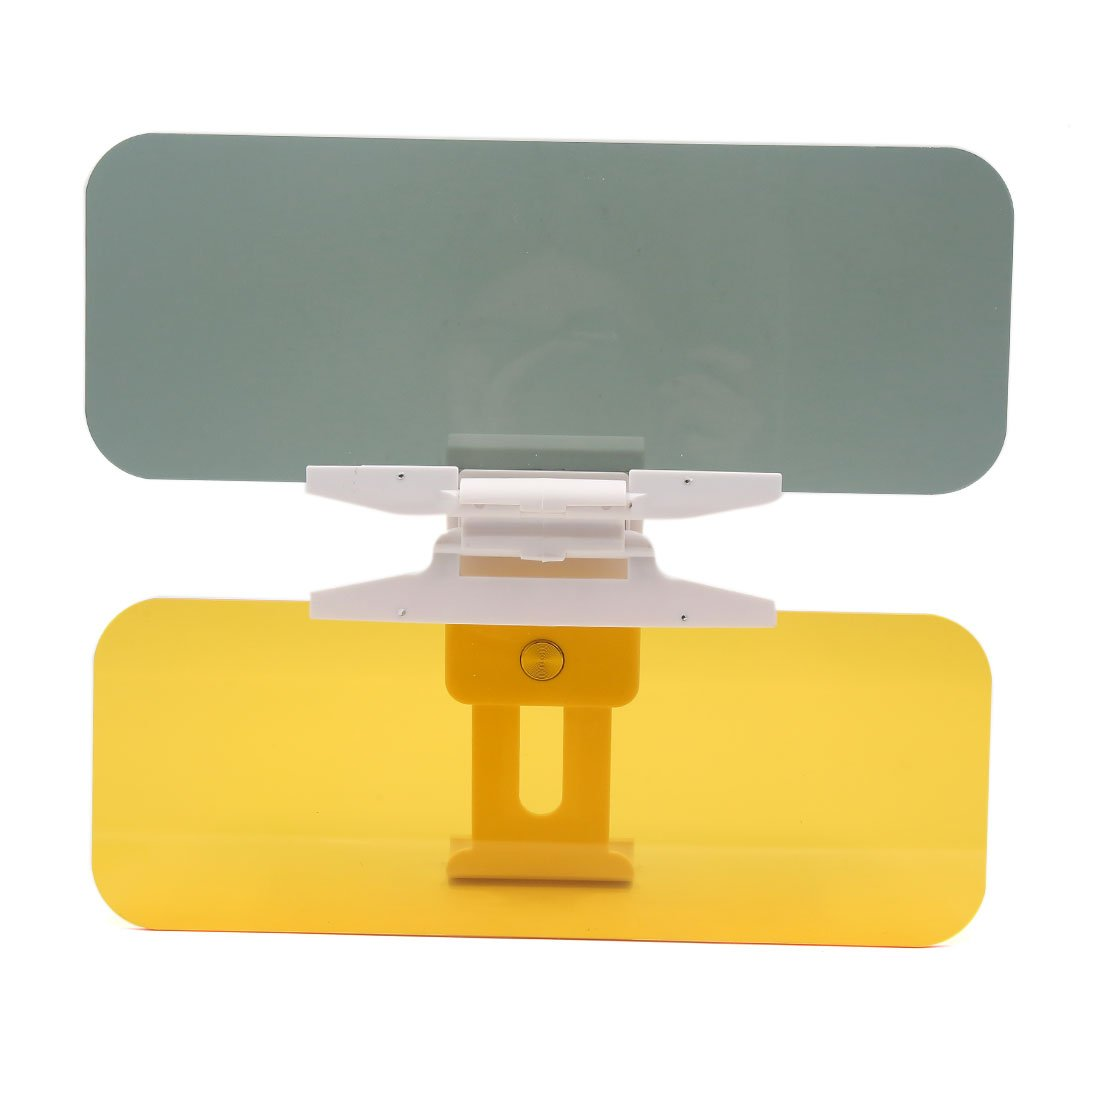 uxcell a17040700ux0077 Car Anti-Glare Visor